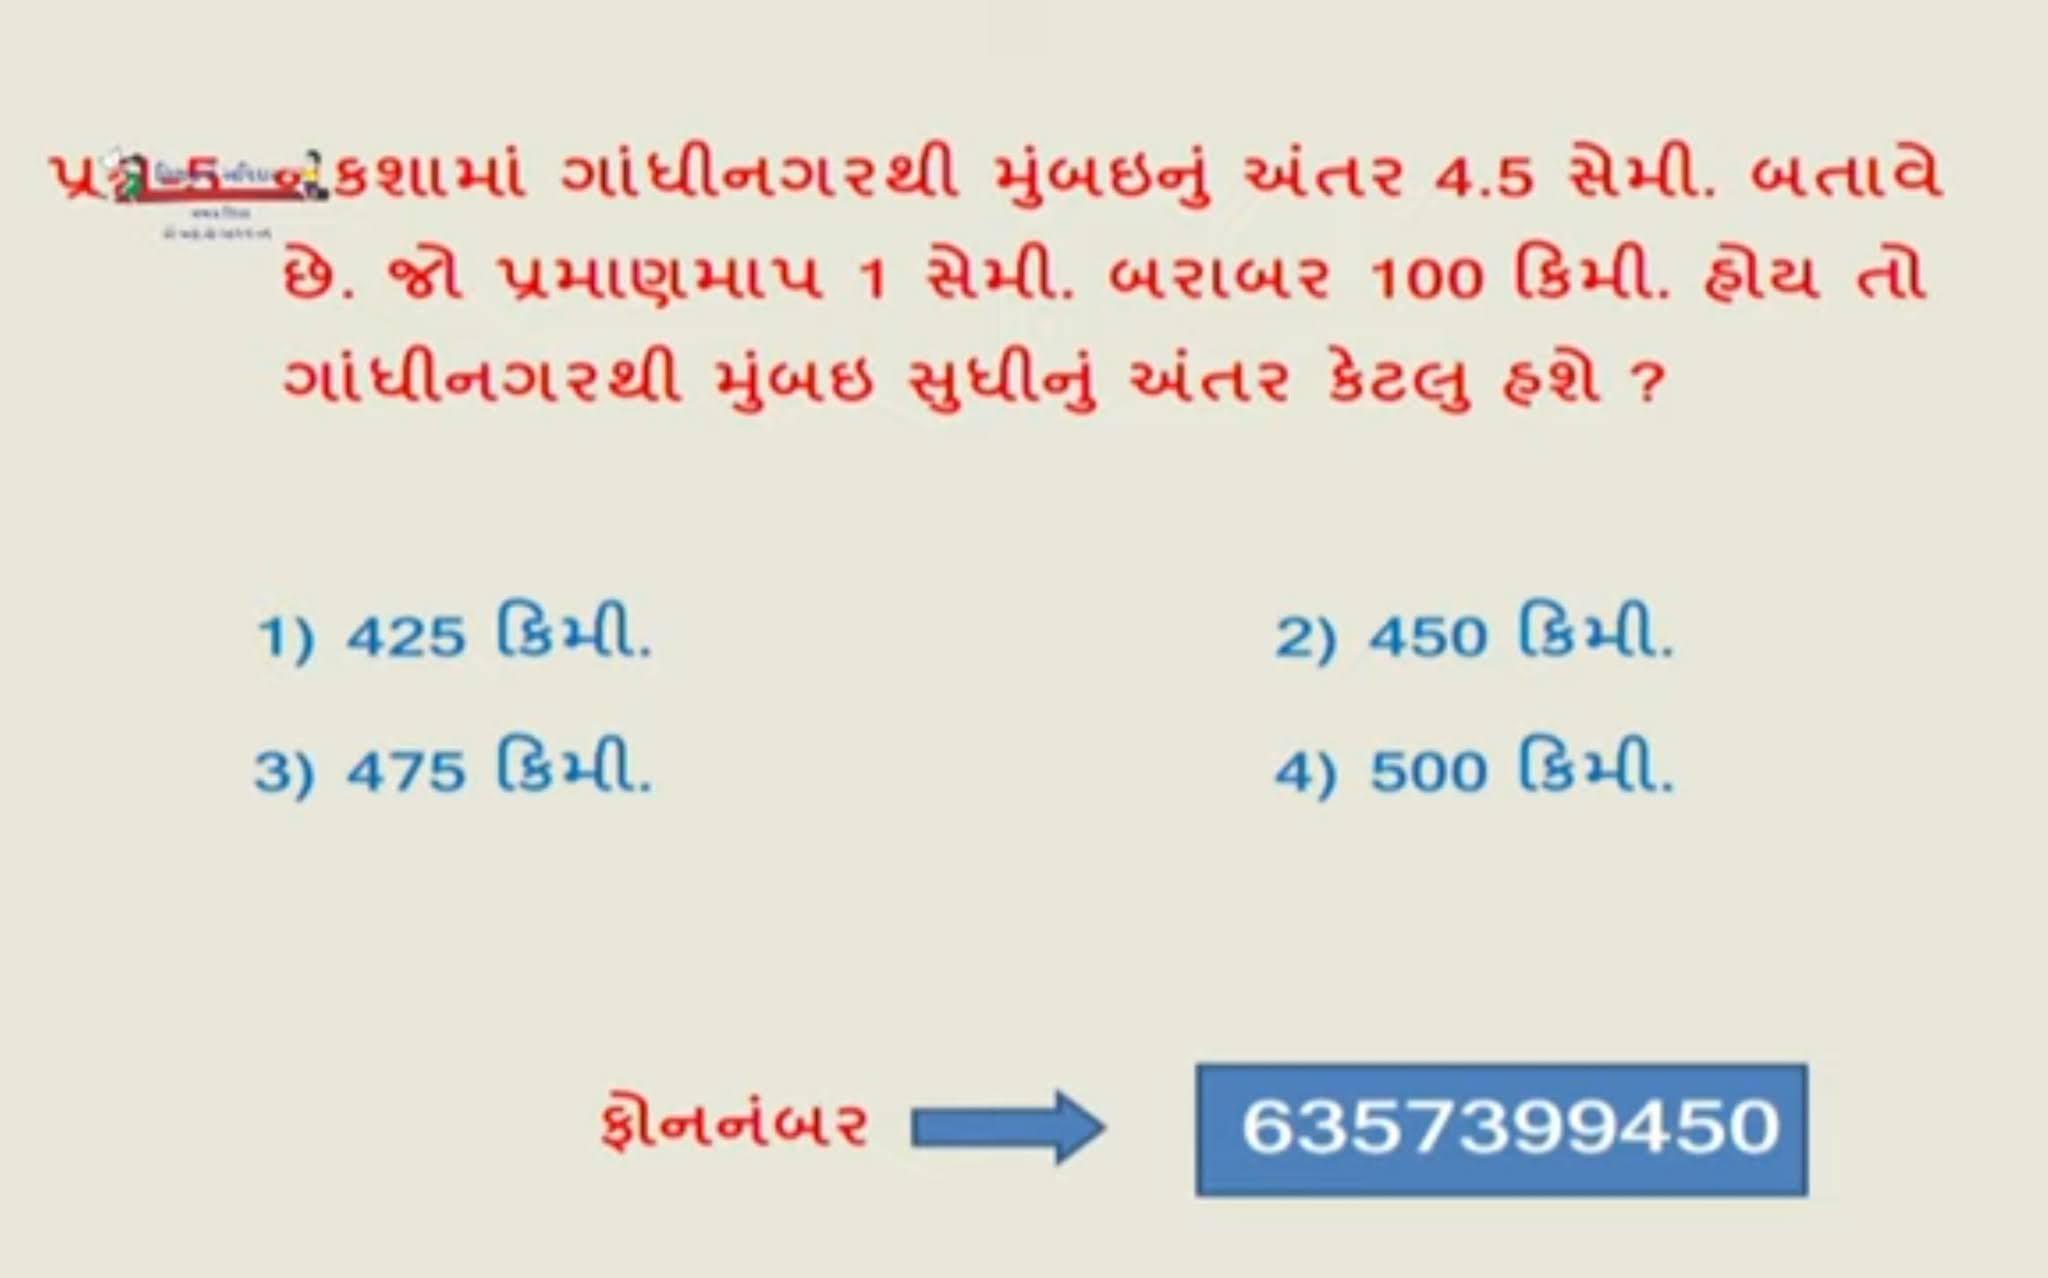 home learning Gujarat job portal